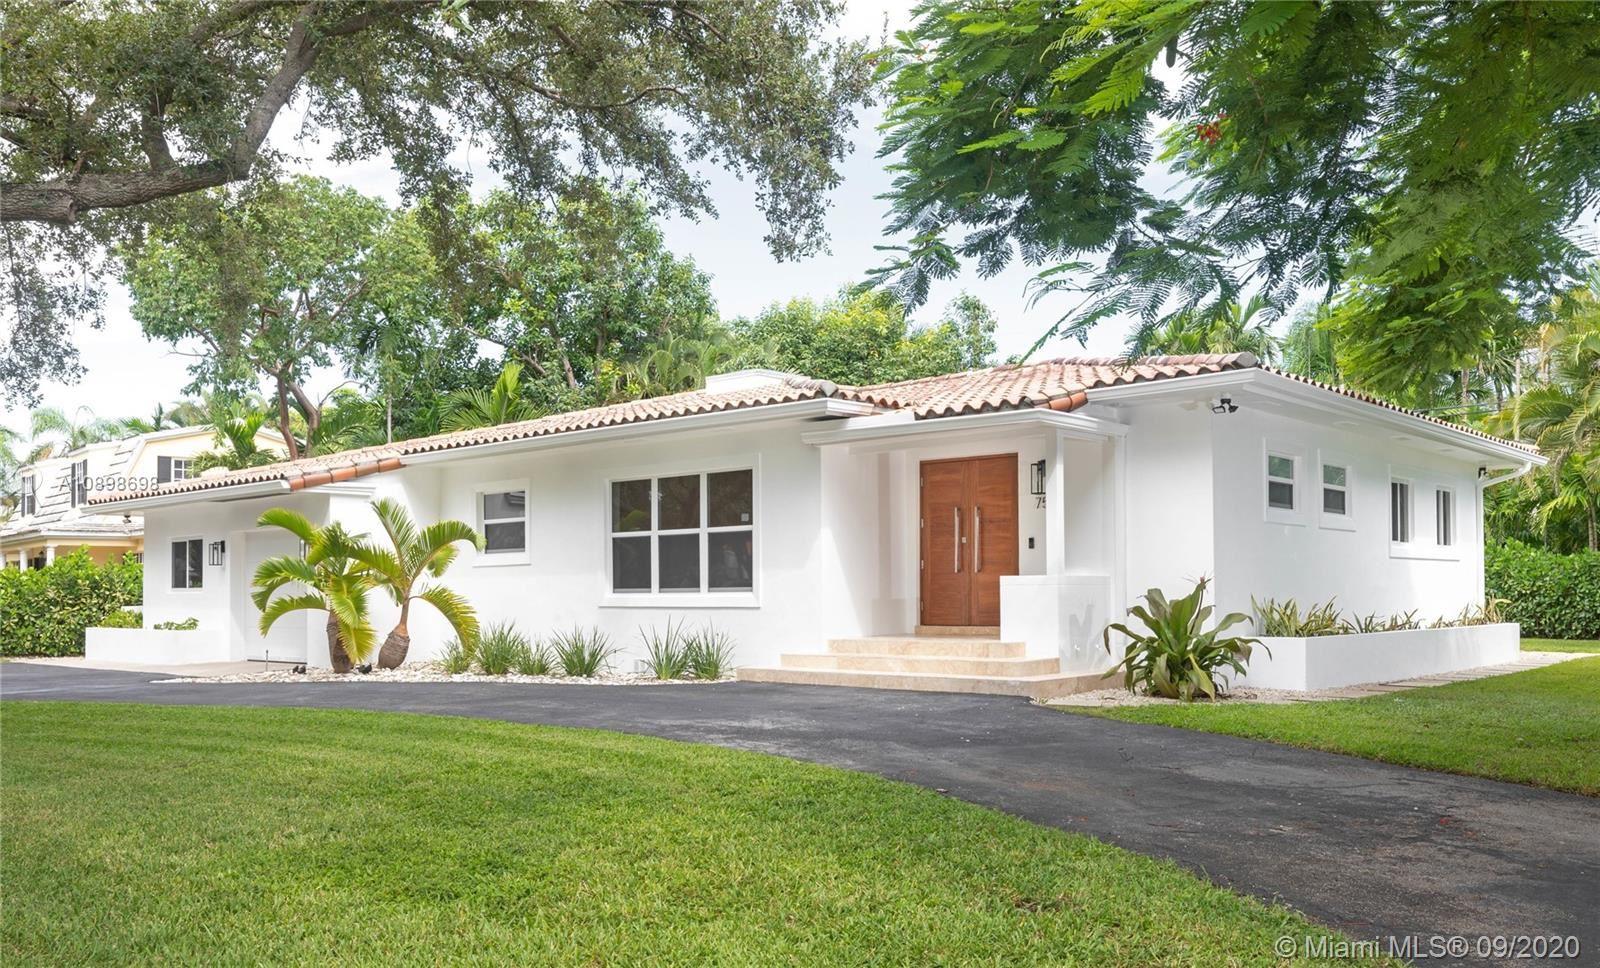 750 Paradiso Ave, Coral Gables, FL 33146 - #: A10898698